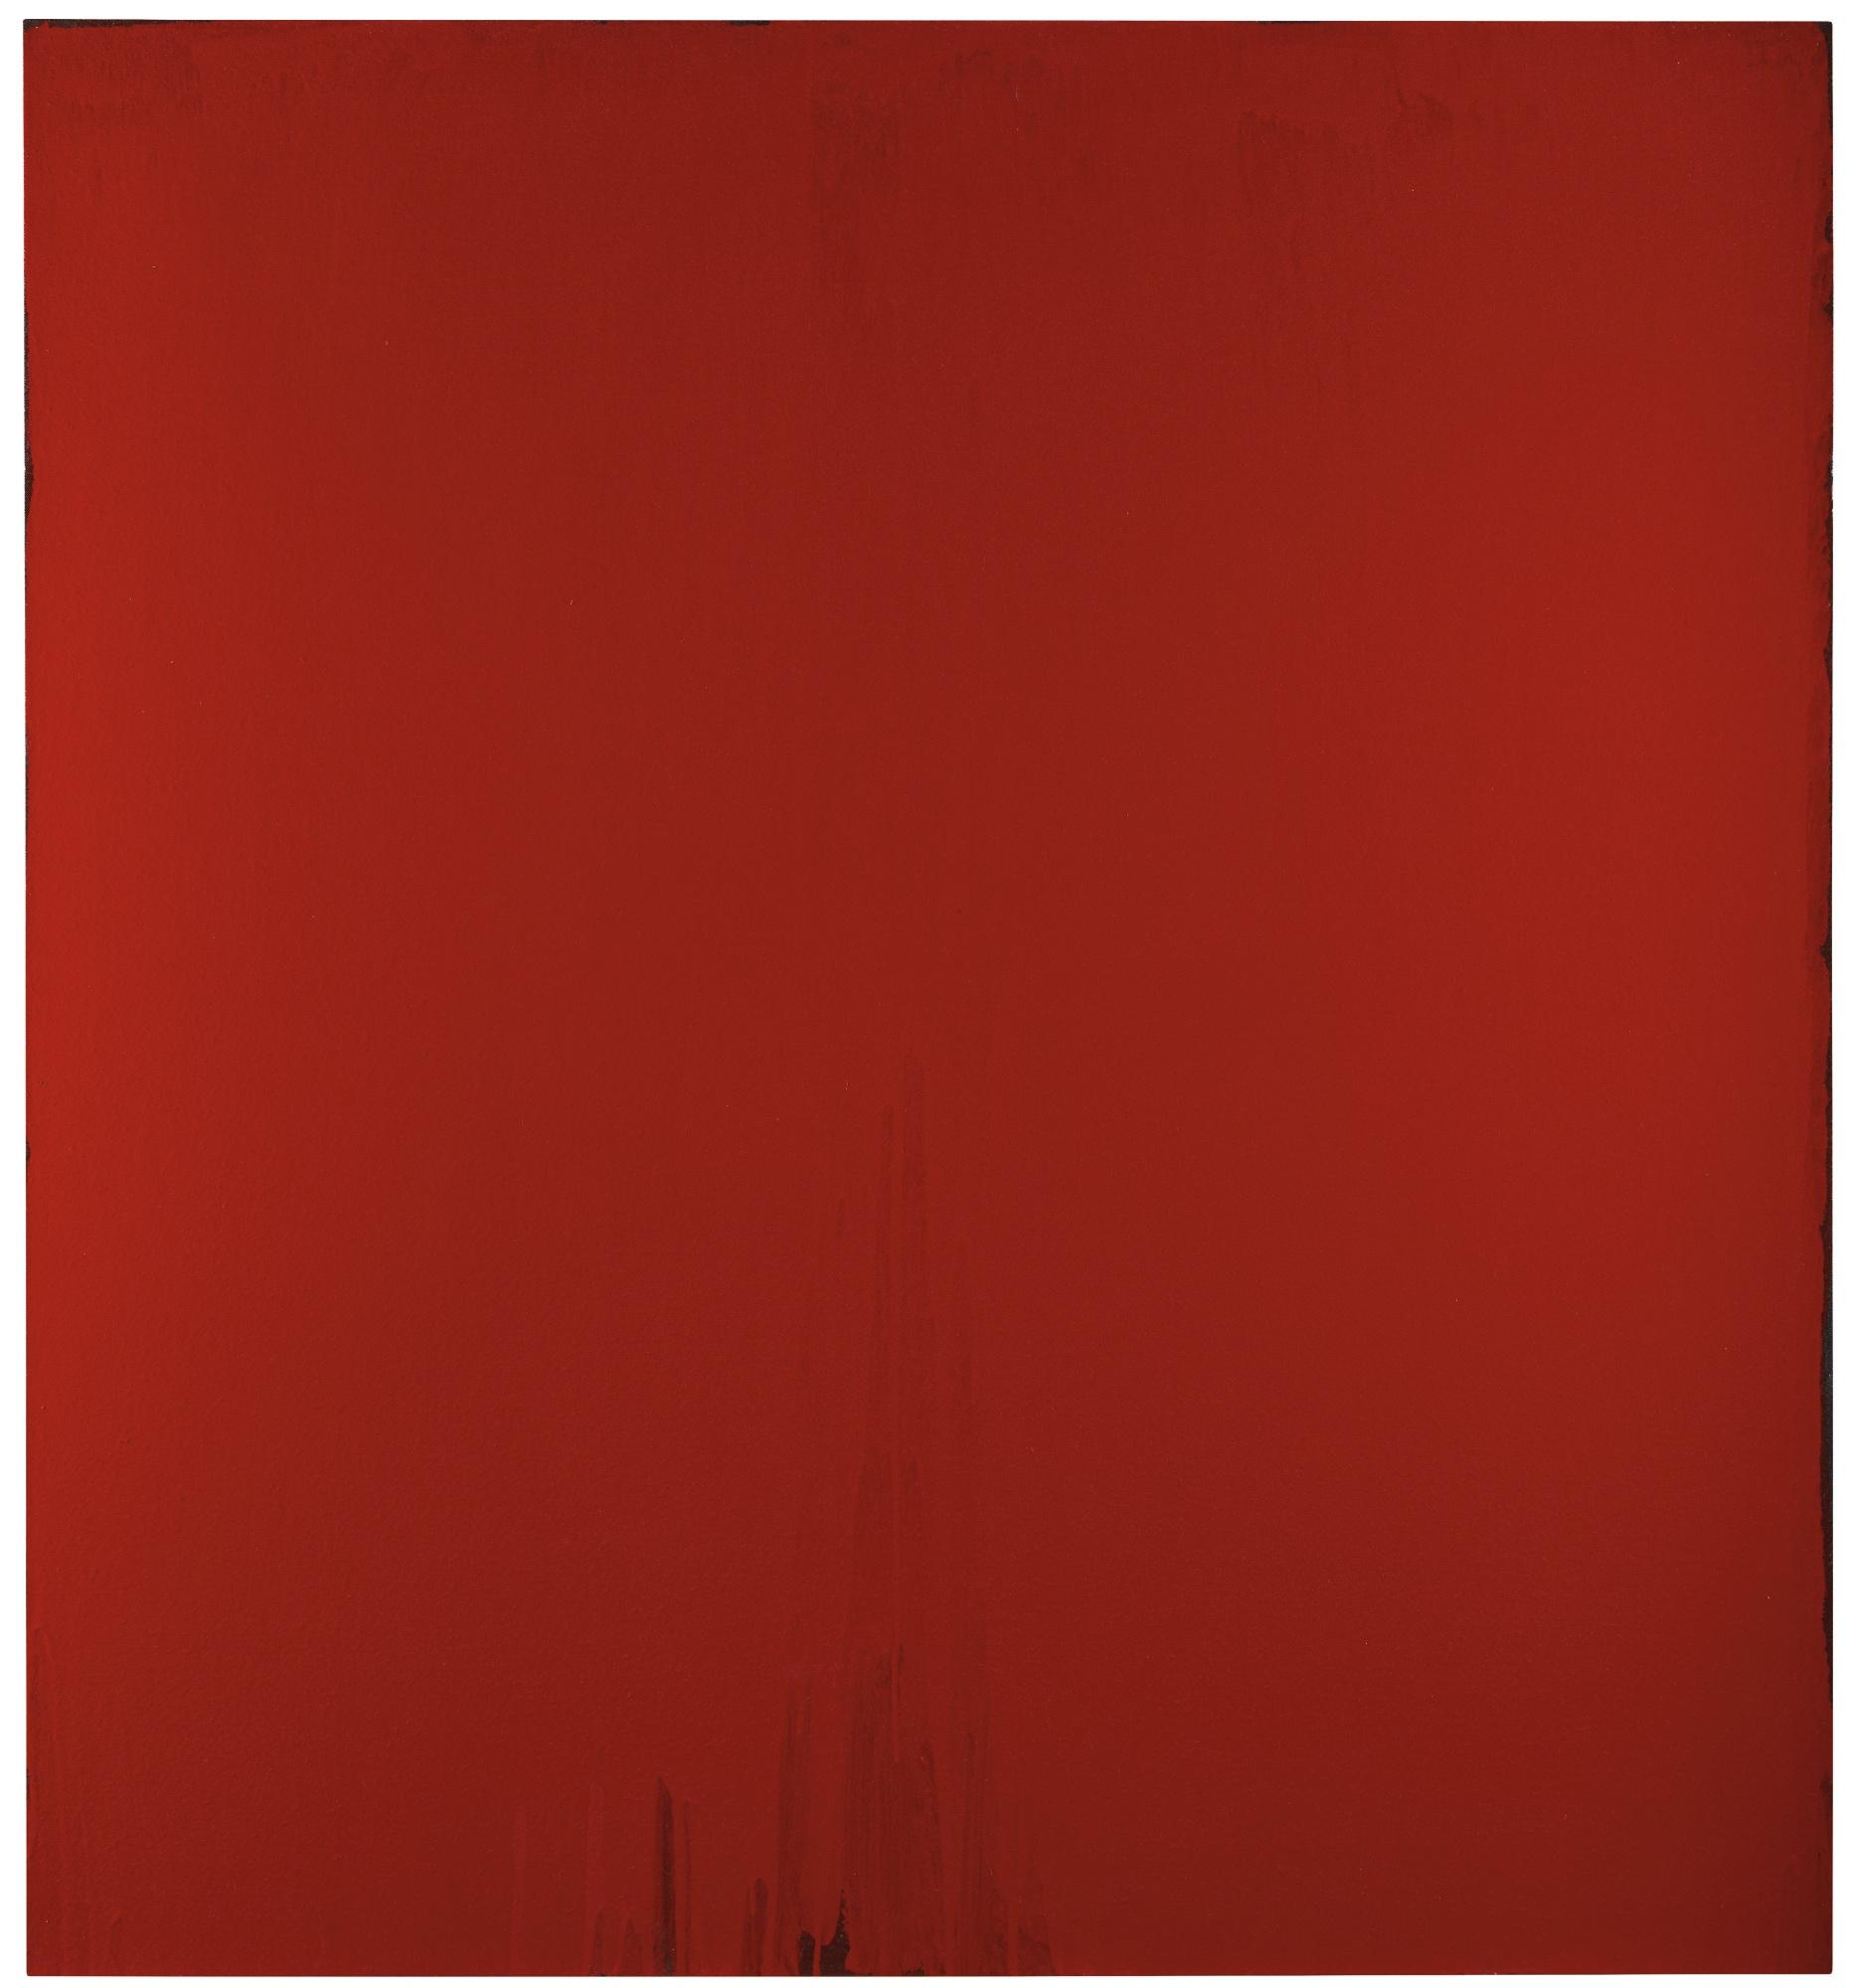 Joseph Marioni-Red Painting-1995